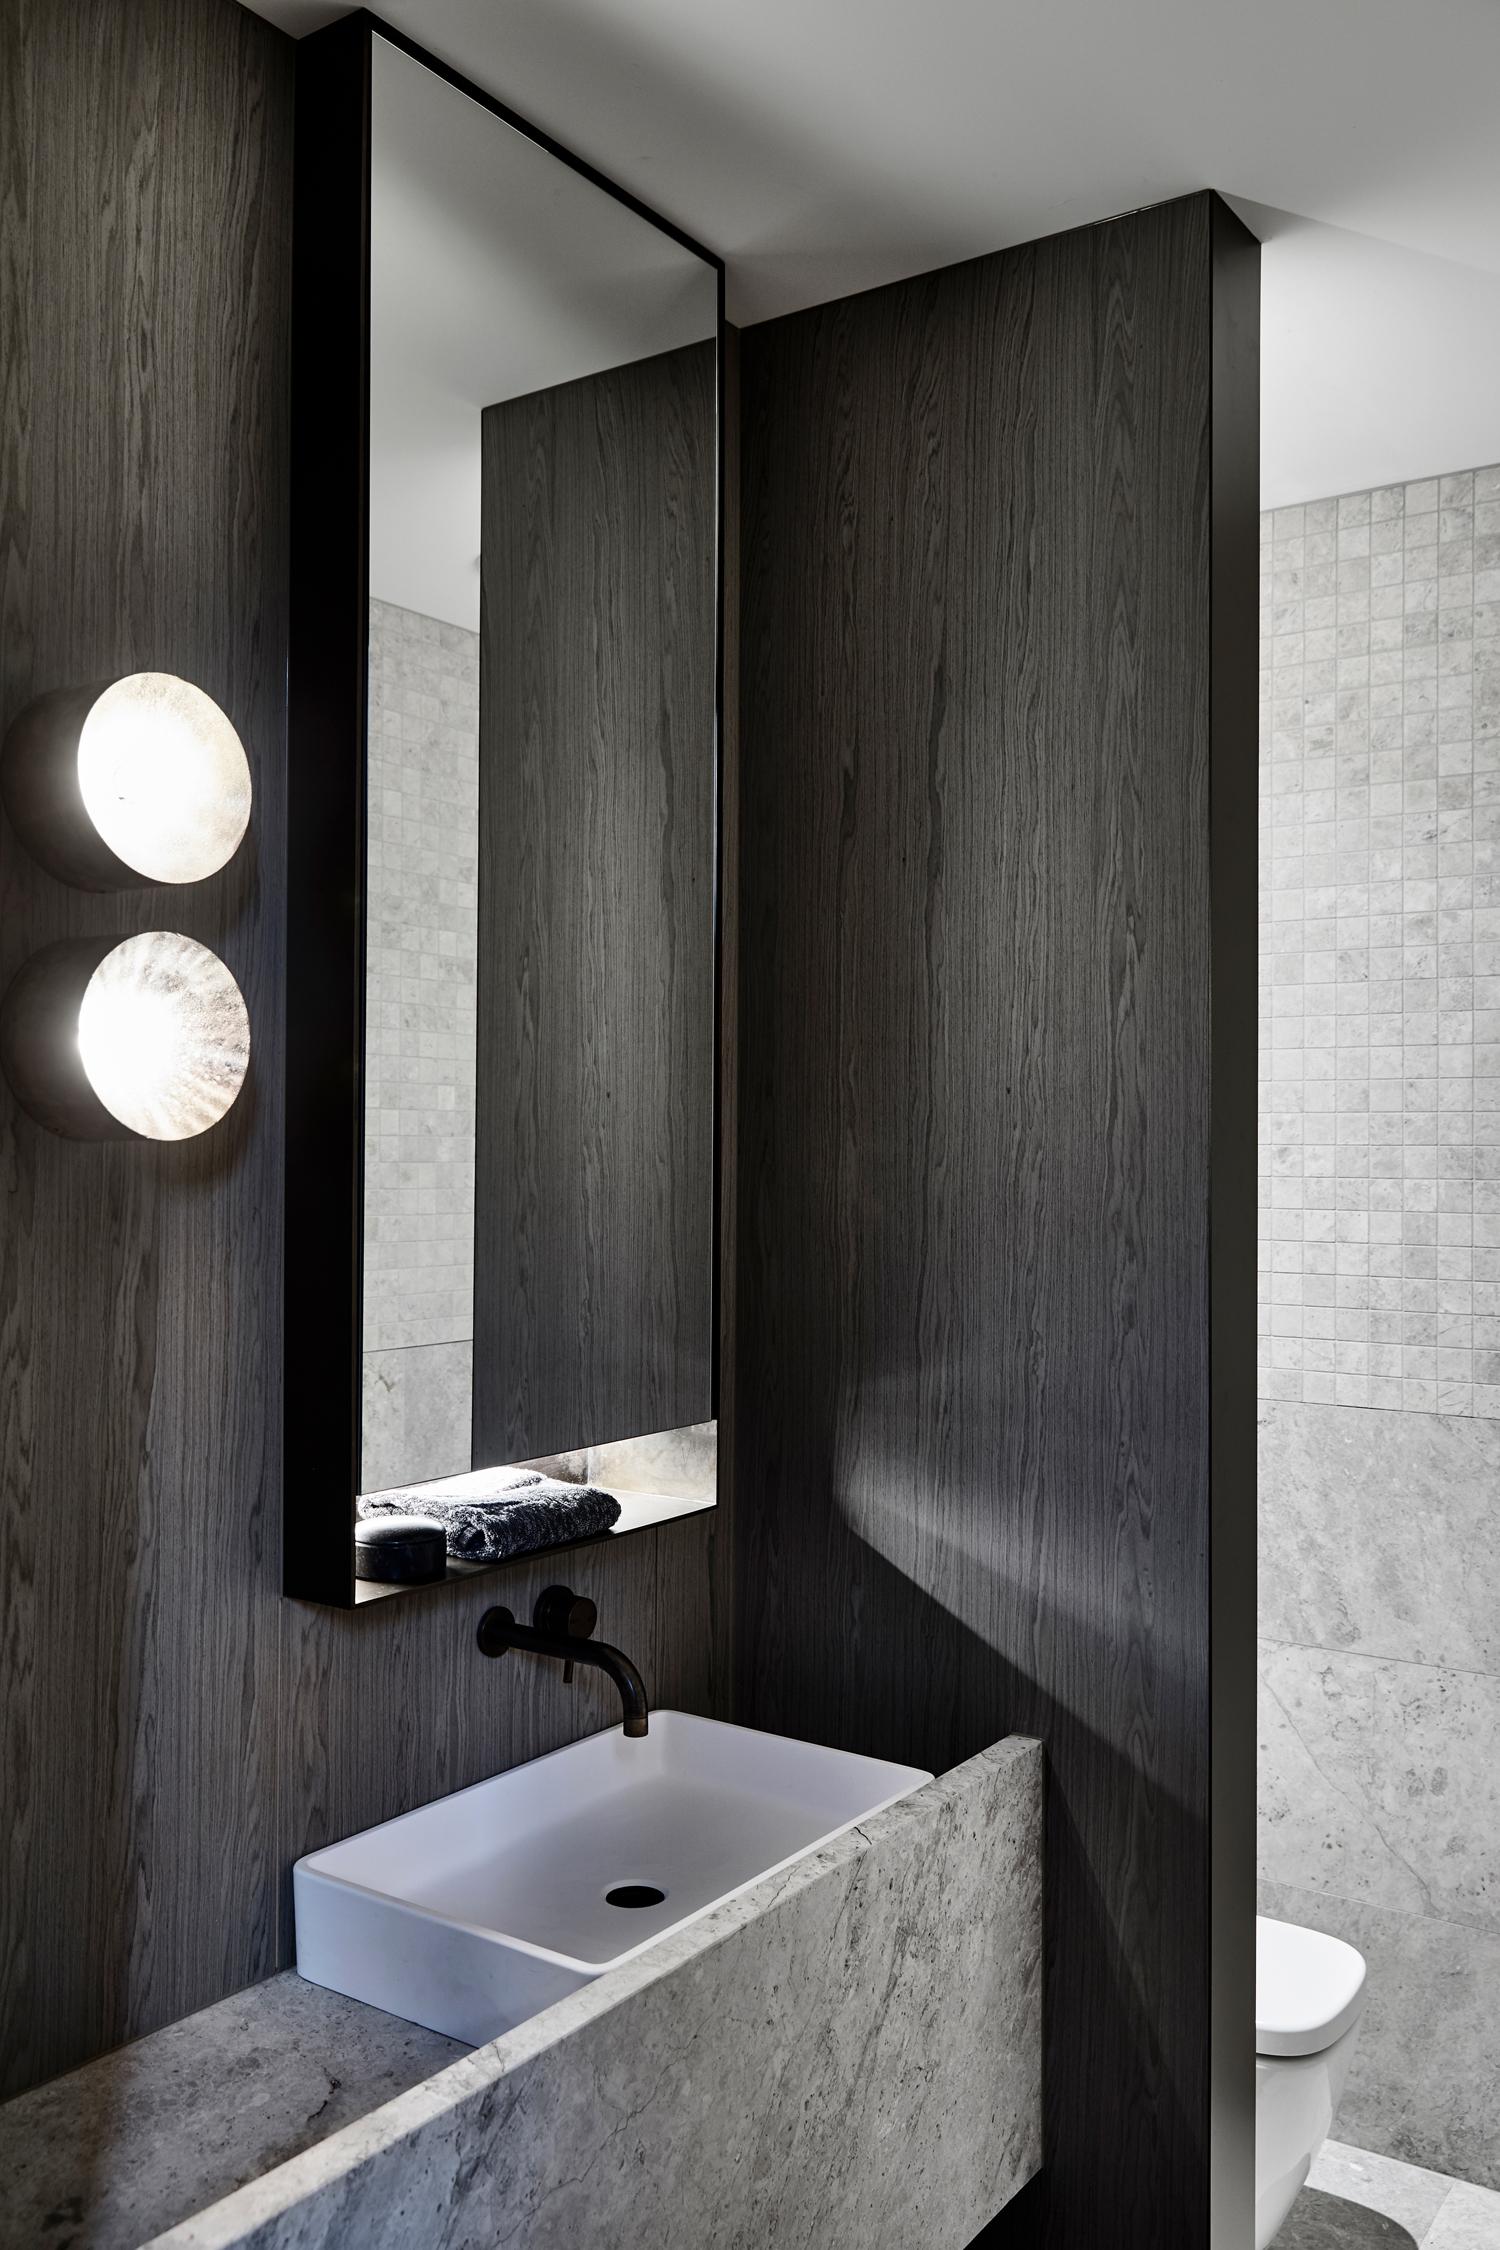 Workroom Architetcure_Agushi building_Meanwhiloe in Melbourne - Bathroom Design